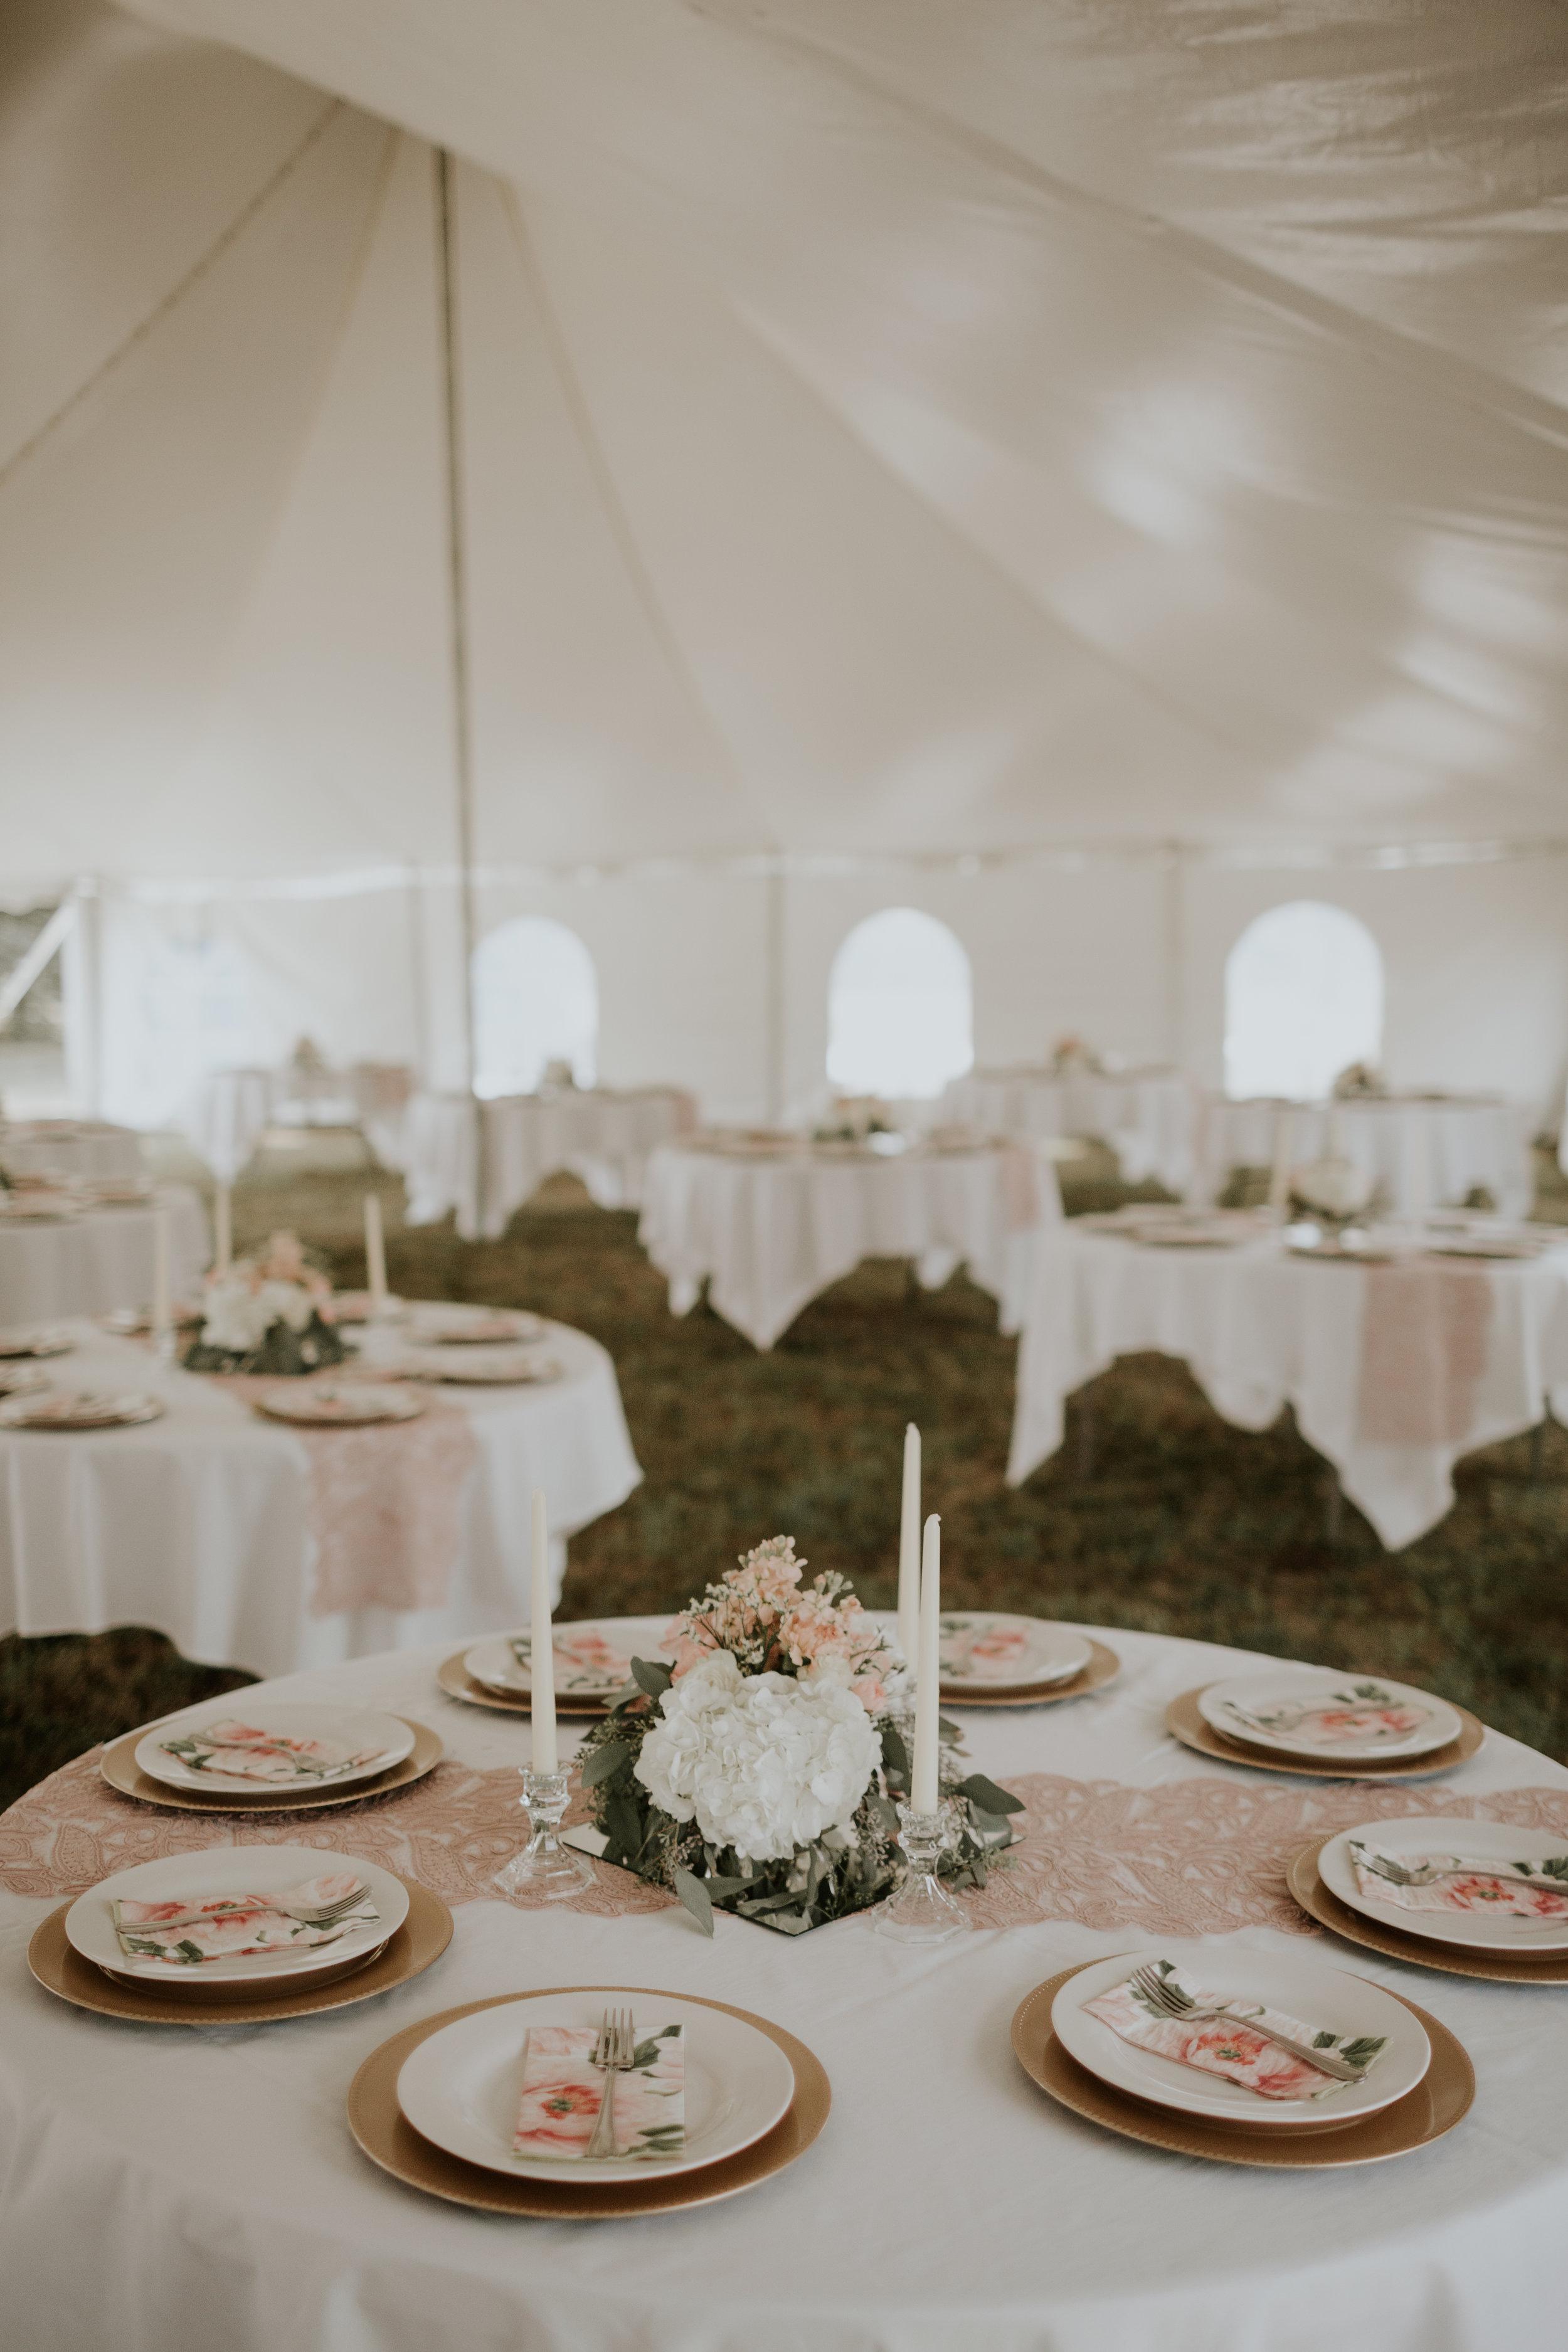 Olympic-Peninsula-Wedding-Photographer-PNW-Forks-Port-Angeles-Kayla-Dawn-Photography-engagement-Olympic-National-Park-83.jpg